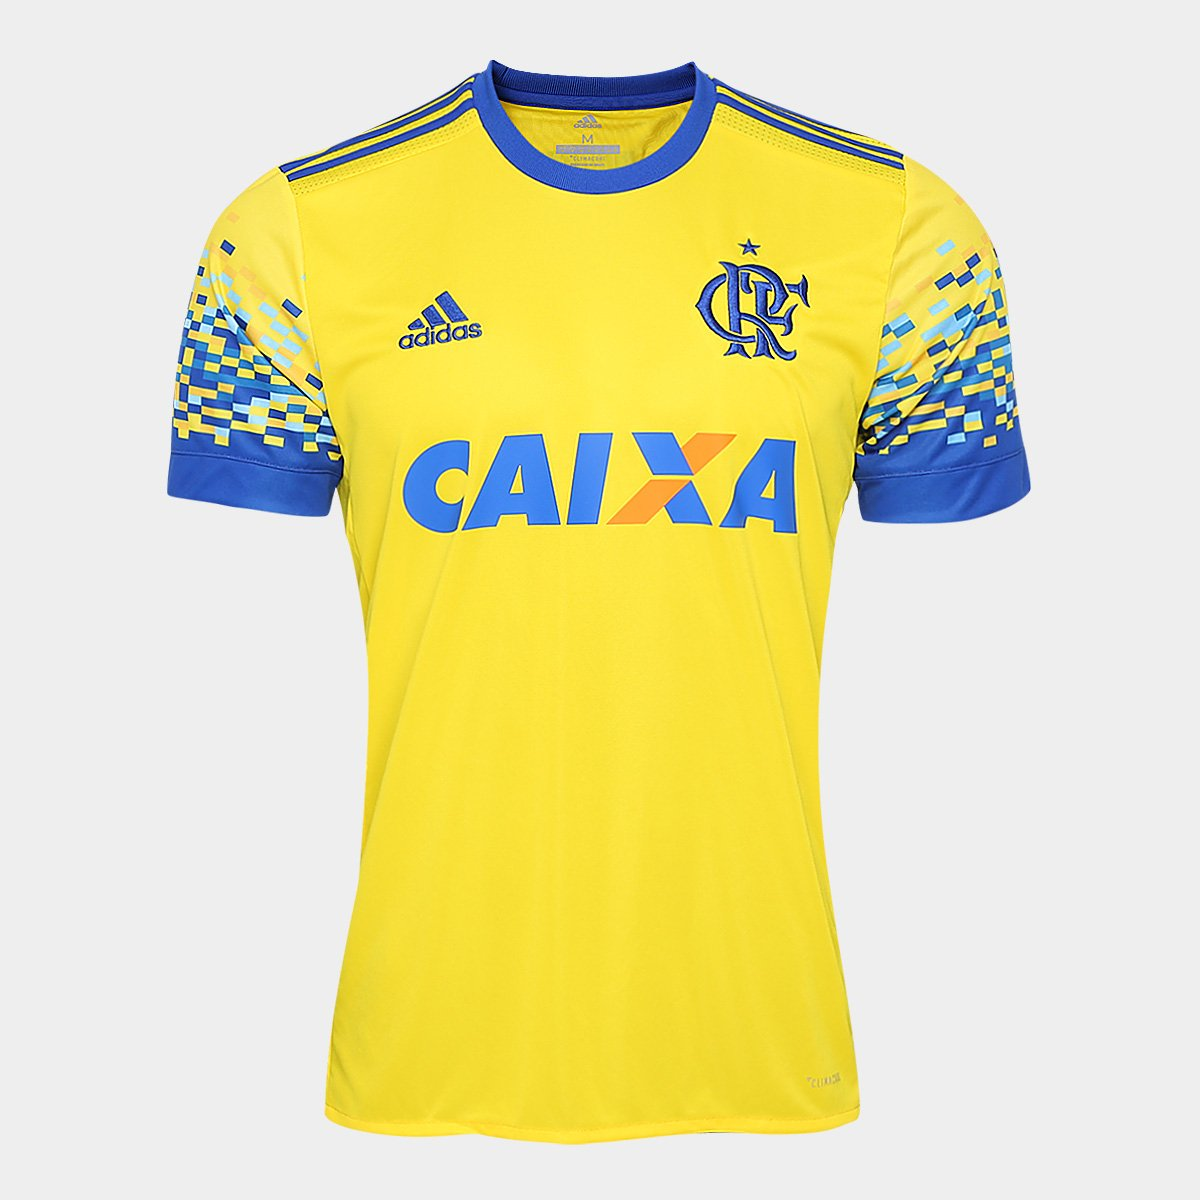 4bd9902db4 Camisa Flamengo III 17 18 s nº Torcedor Adidas Masculina